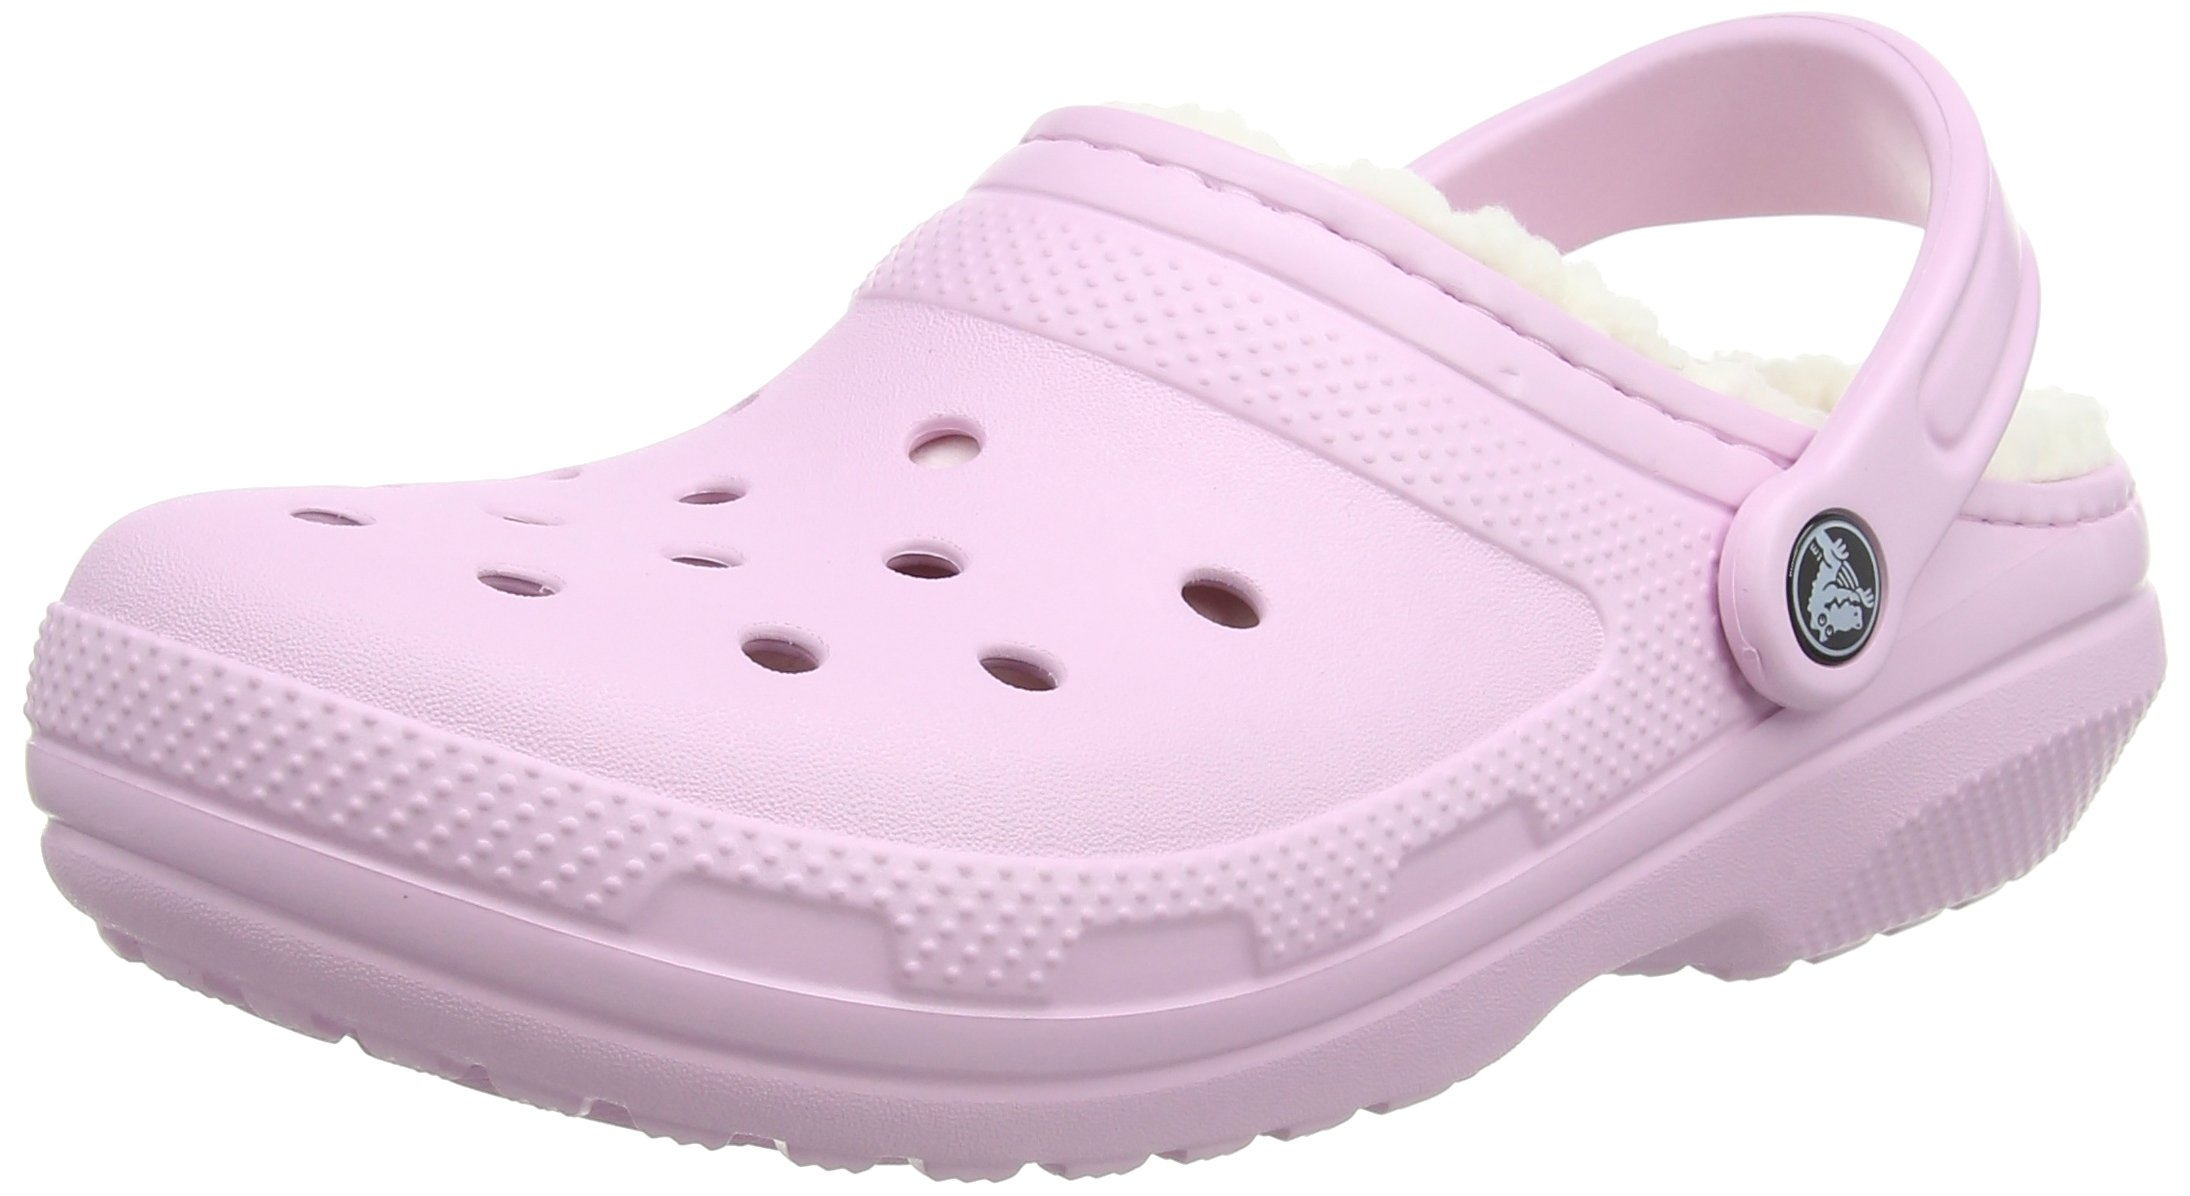 Crocs Unisex Classic Lined Clog,Ballerina Pink/Oatmeal,4 US Men / 6 US Women